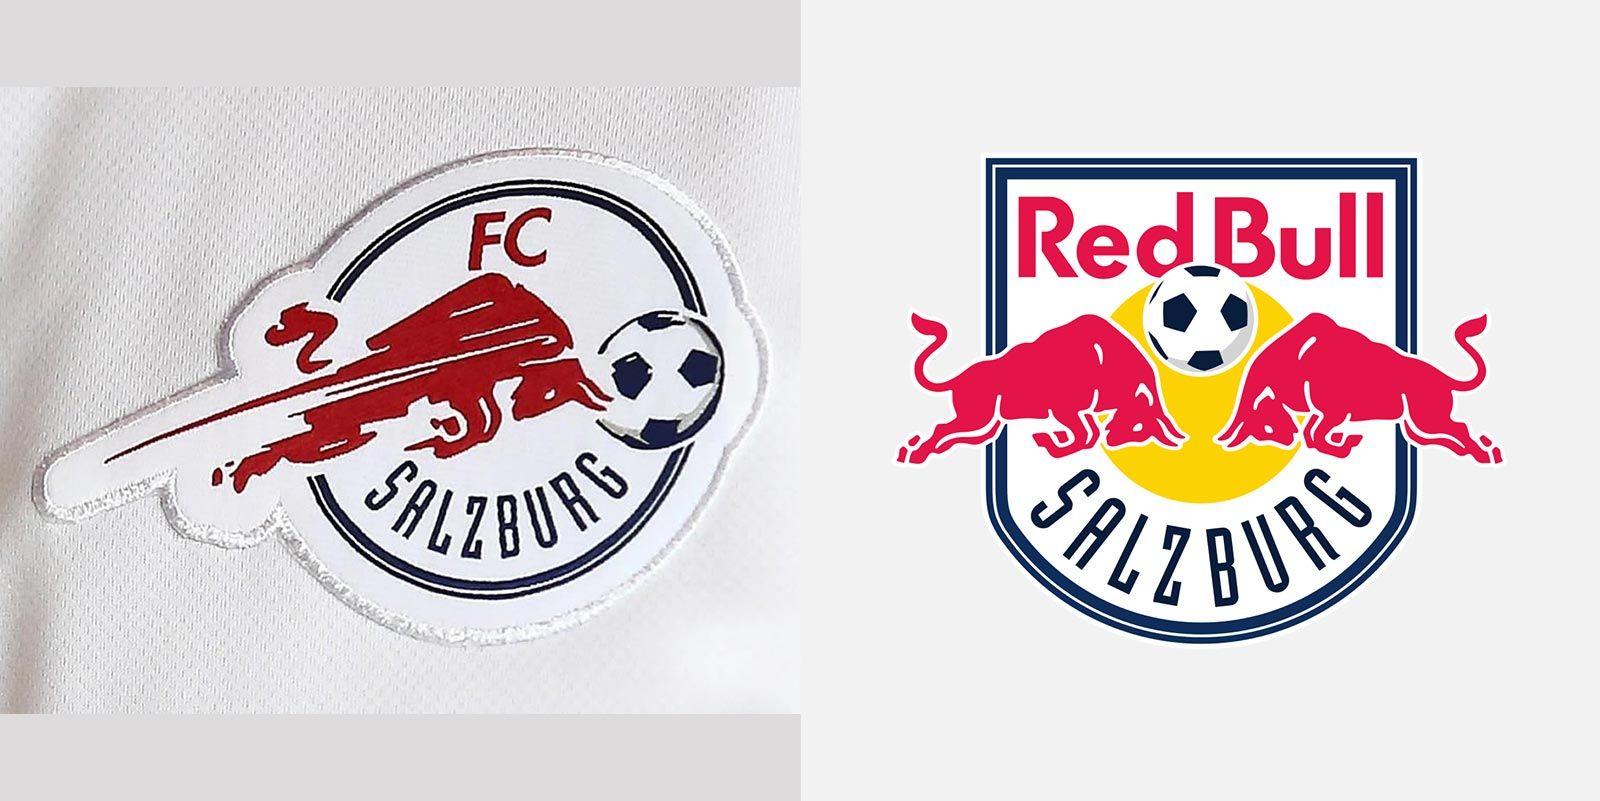 Rb Leipzig Salzburg Champions League Badge Champions League Logo Reveal Salzburg